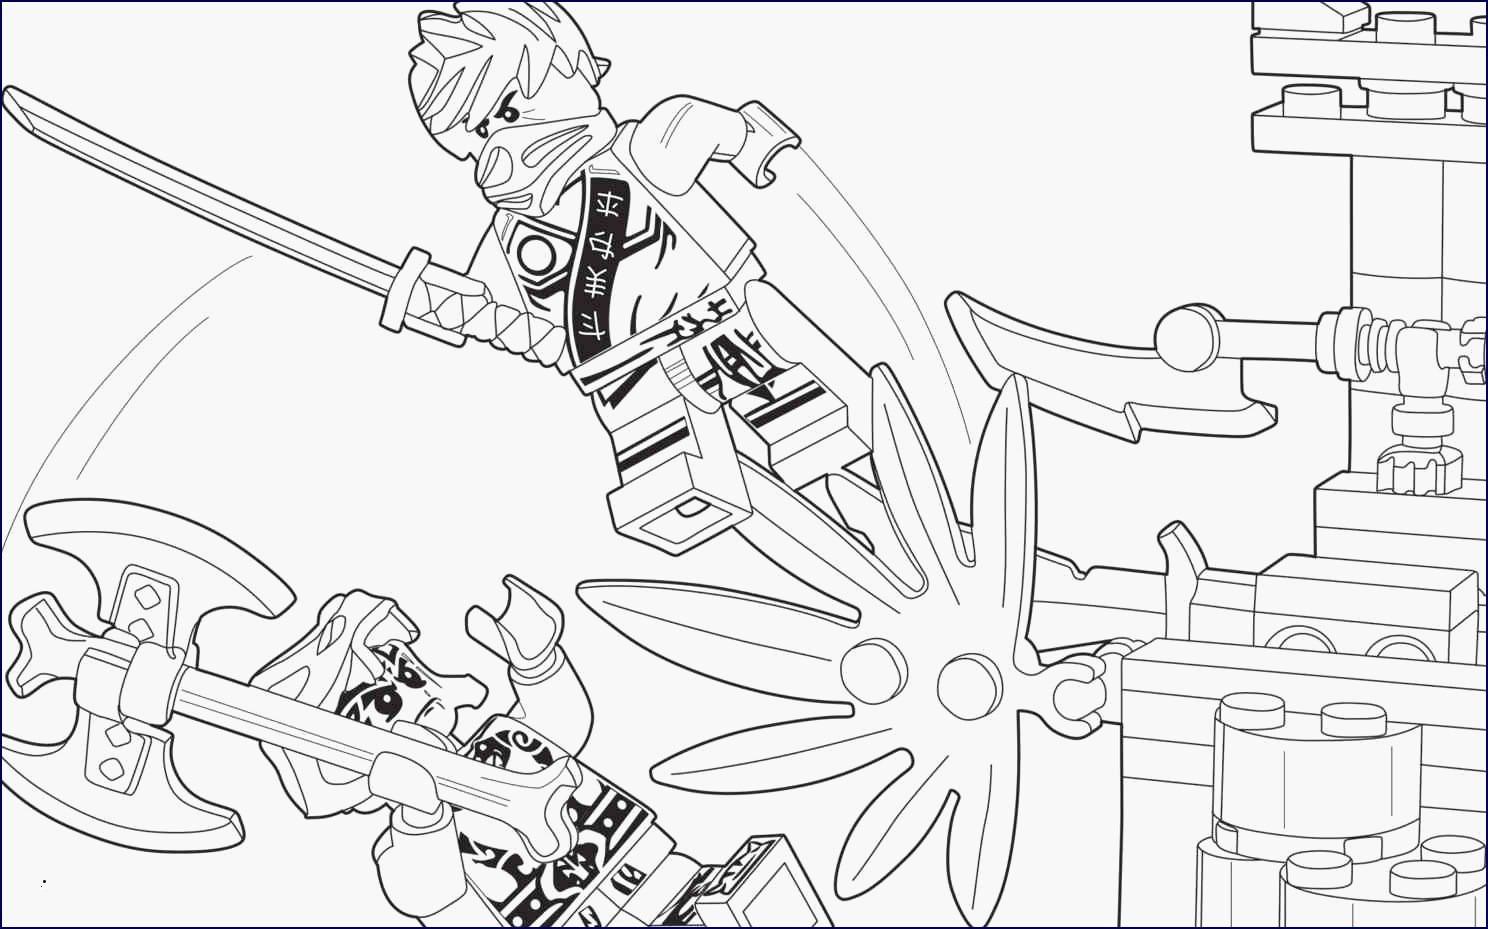 Ausmalbilder Ninjago Schlangen Neu Ausmalbilder Ninjago Schlange – Ausmalbilder Für Kinder … Neu Stock